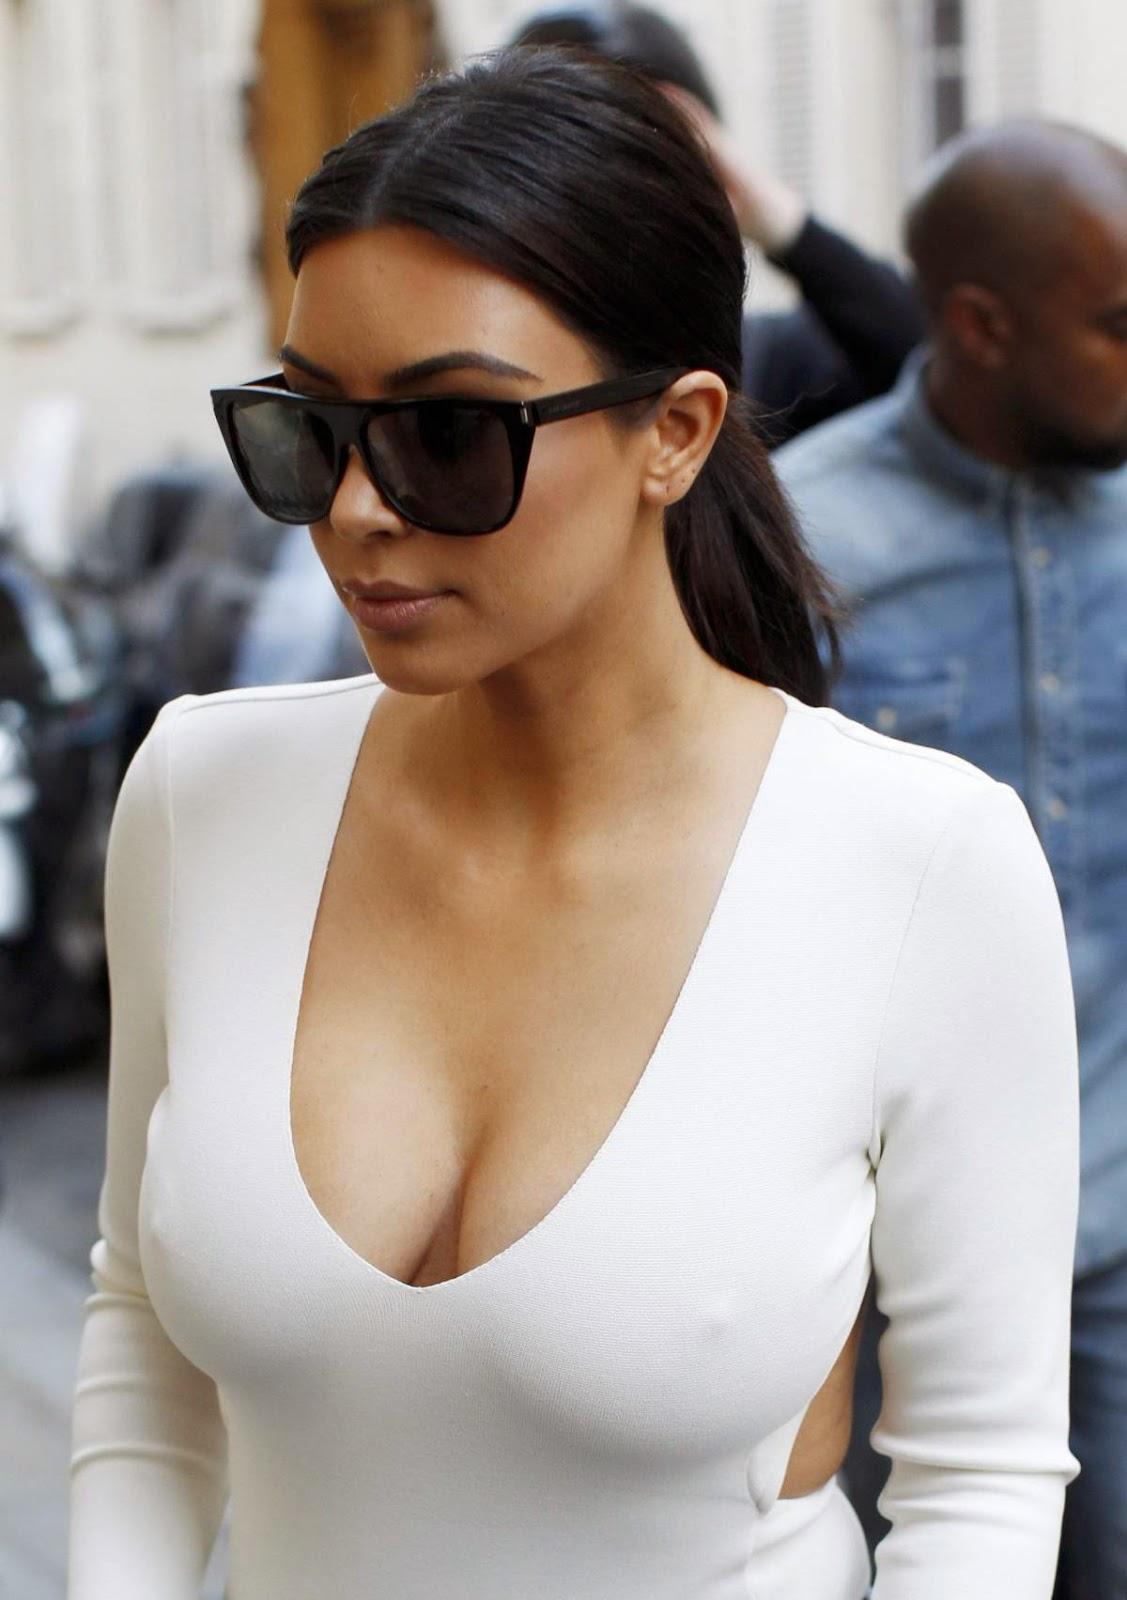 Kim Kardashian - Hot Huge Cleavage Show Photos in Paris